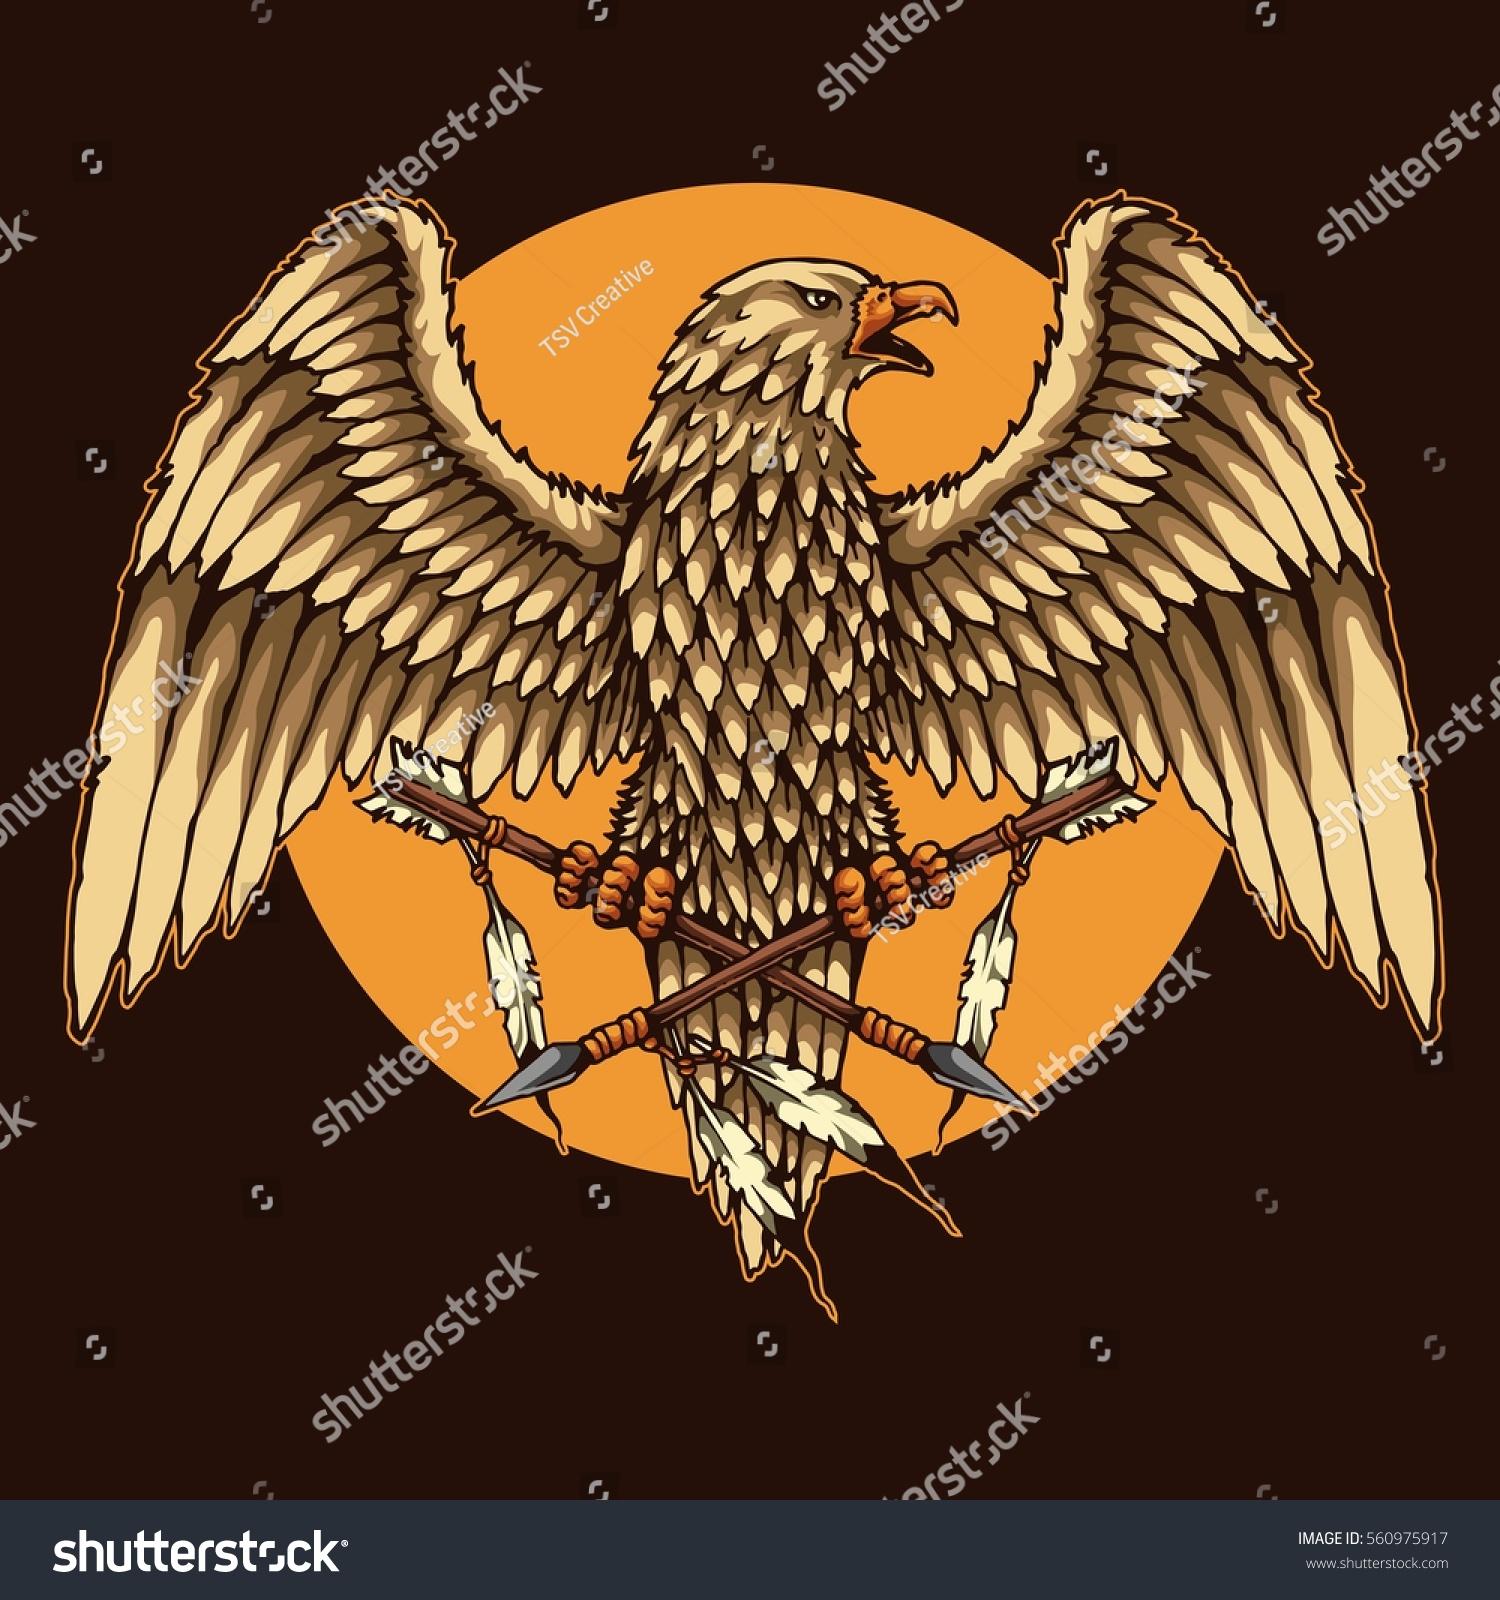 Vector illustration native america eagle stock vector 560975917 vector illustration of native america eagle biocorpaavc Gallery